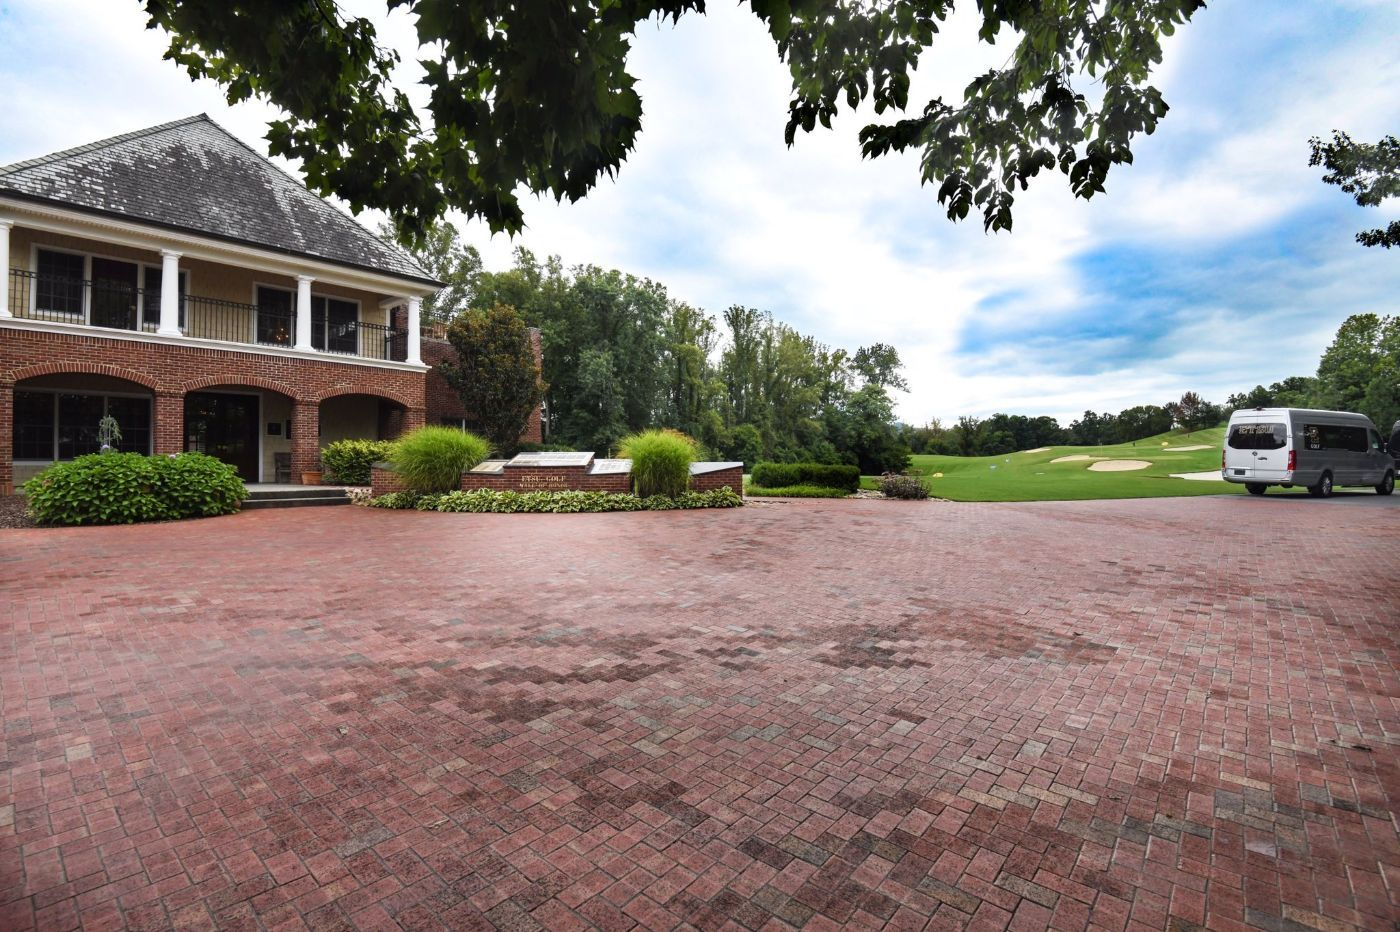 Warren-Greene Golf Center